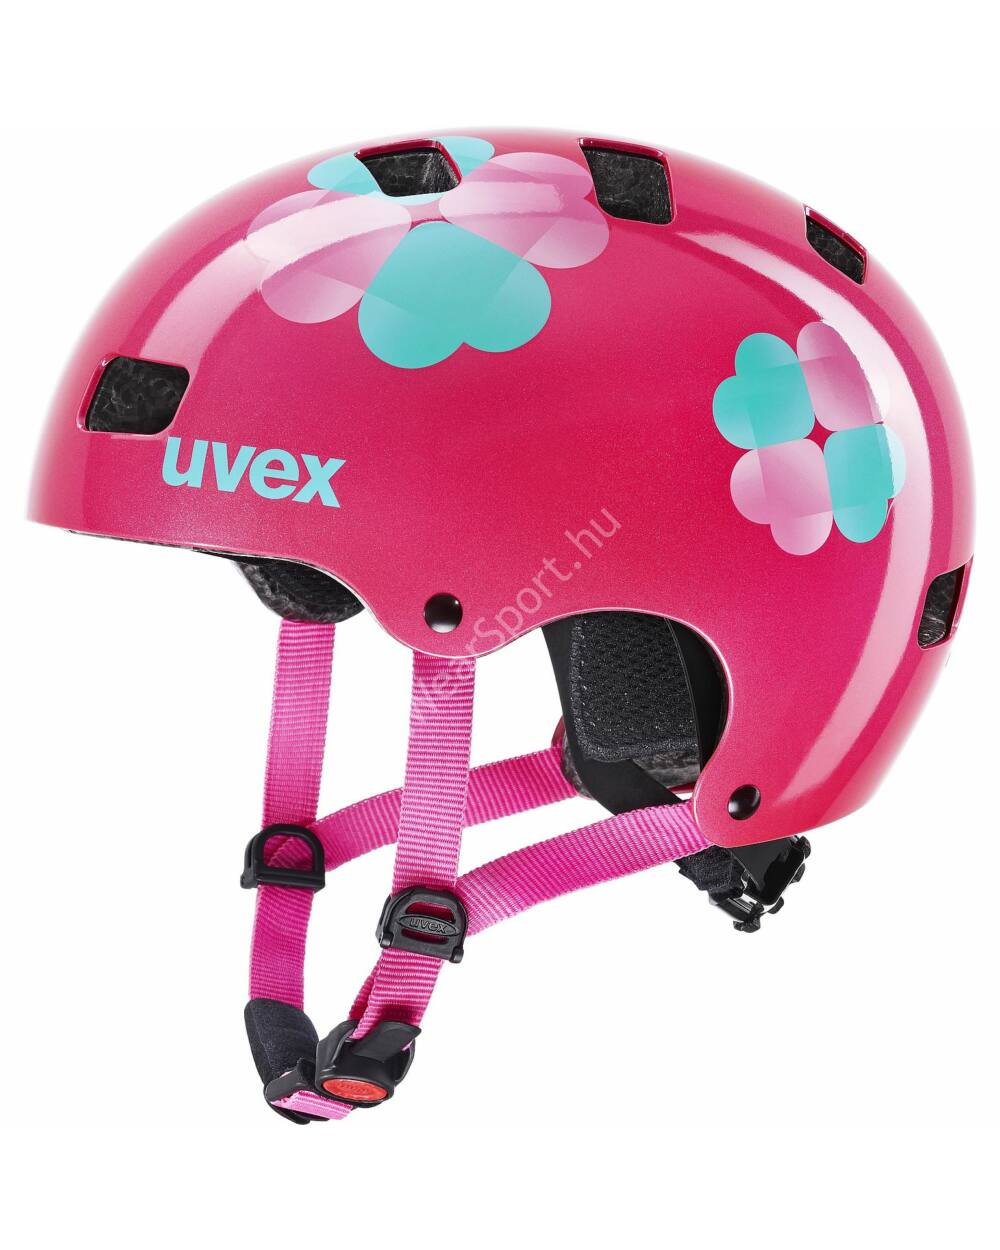 Uvex Kid 3 pink flower bukósisak, 51-55 cm